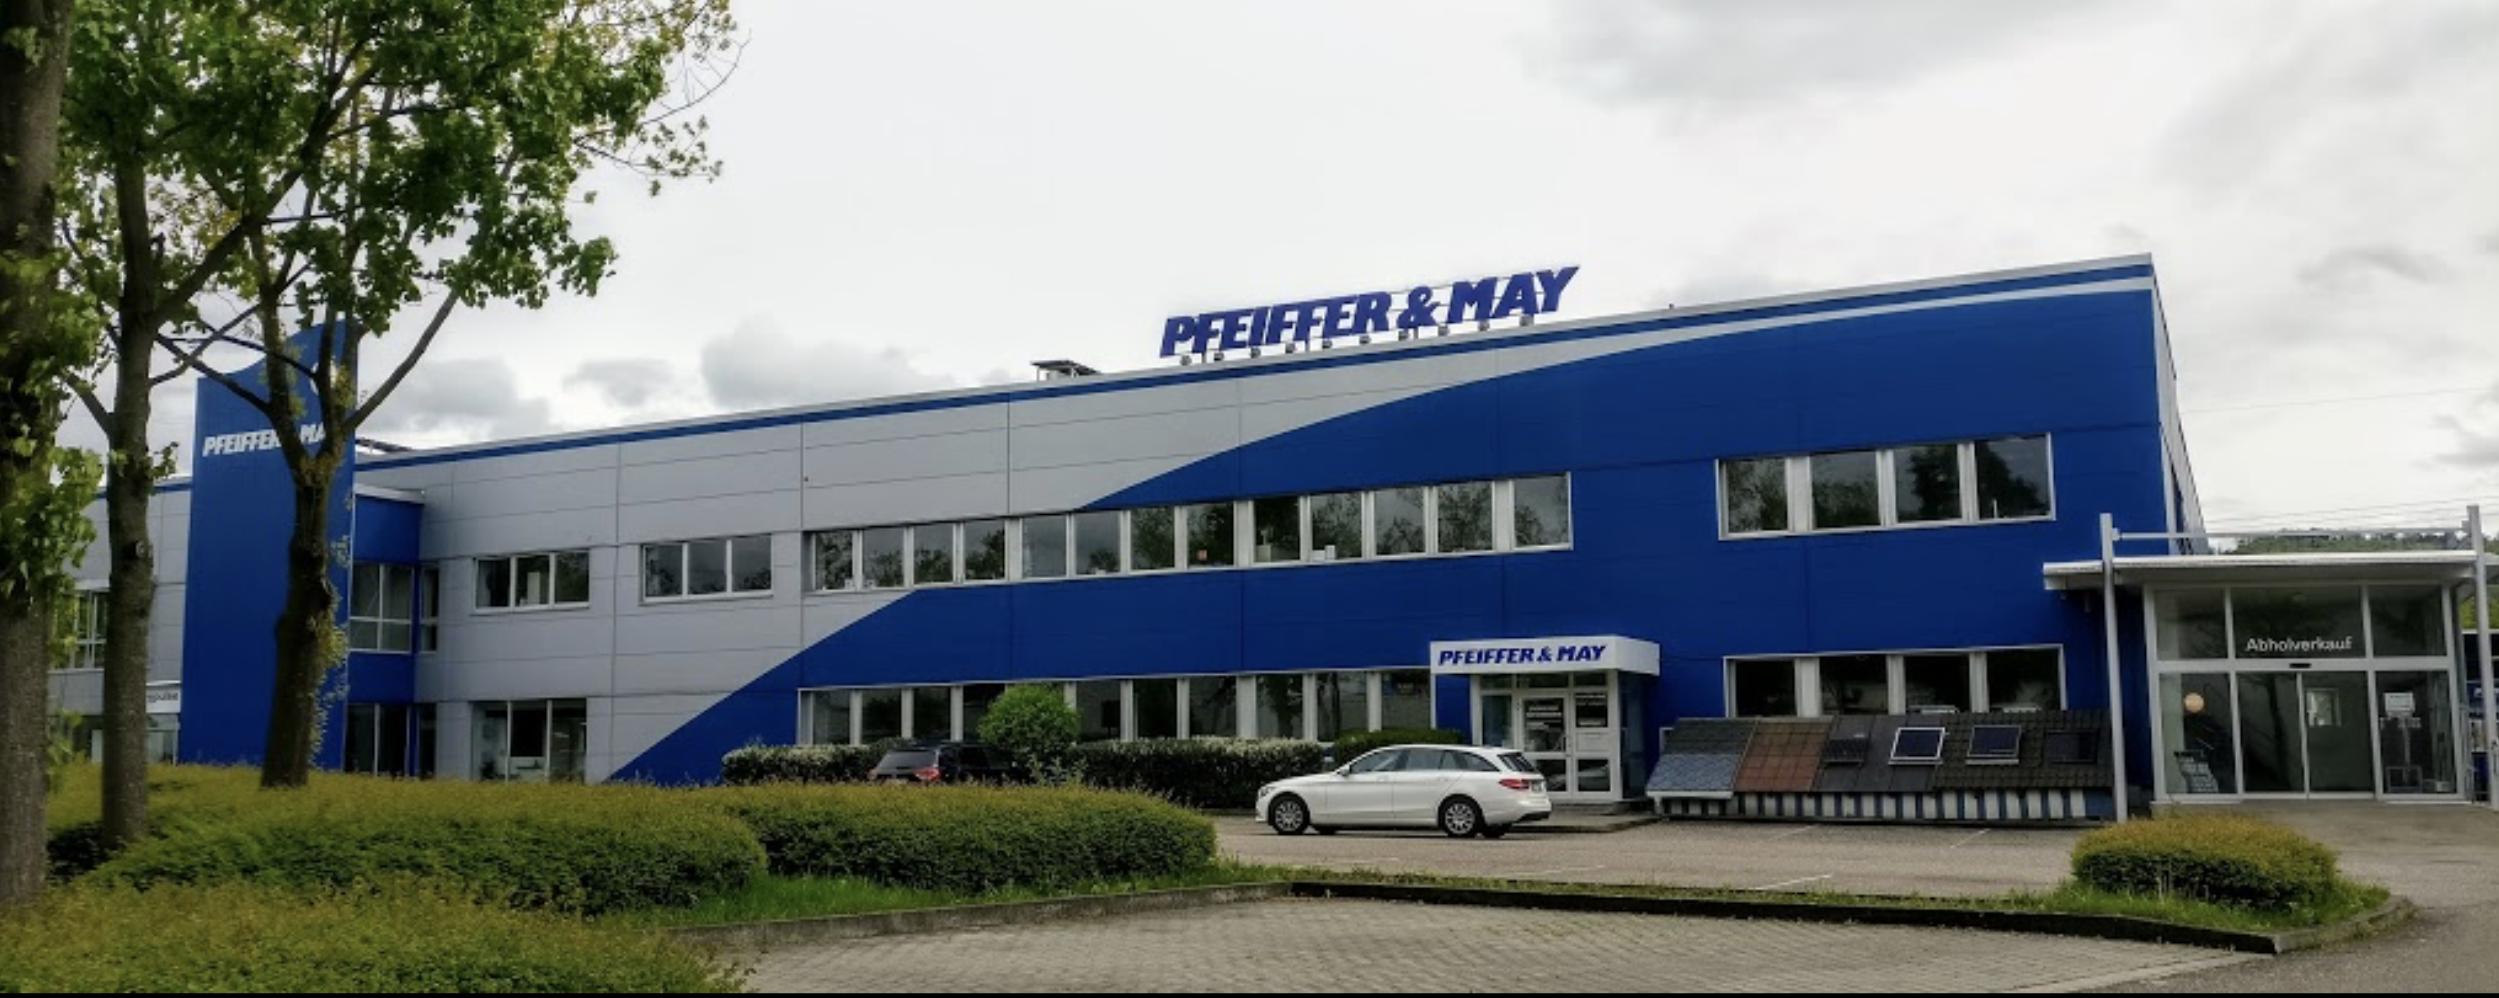 Pfeiffer Und May pfeiffer may marquart